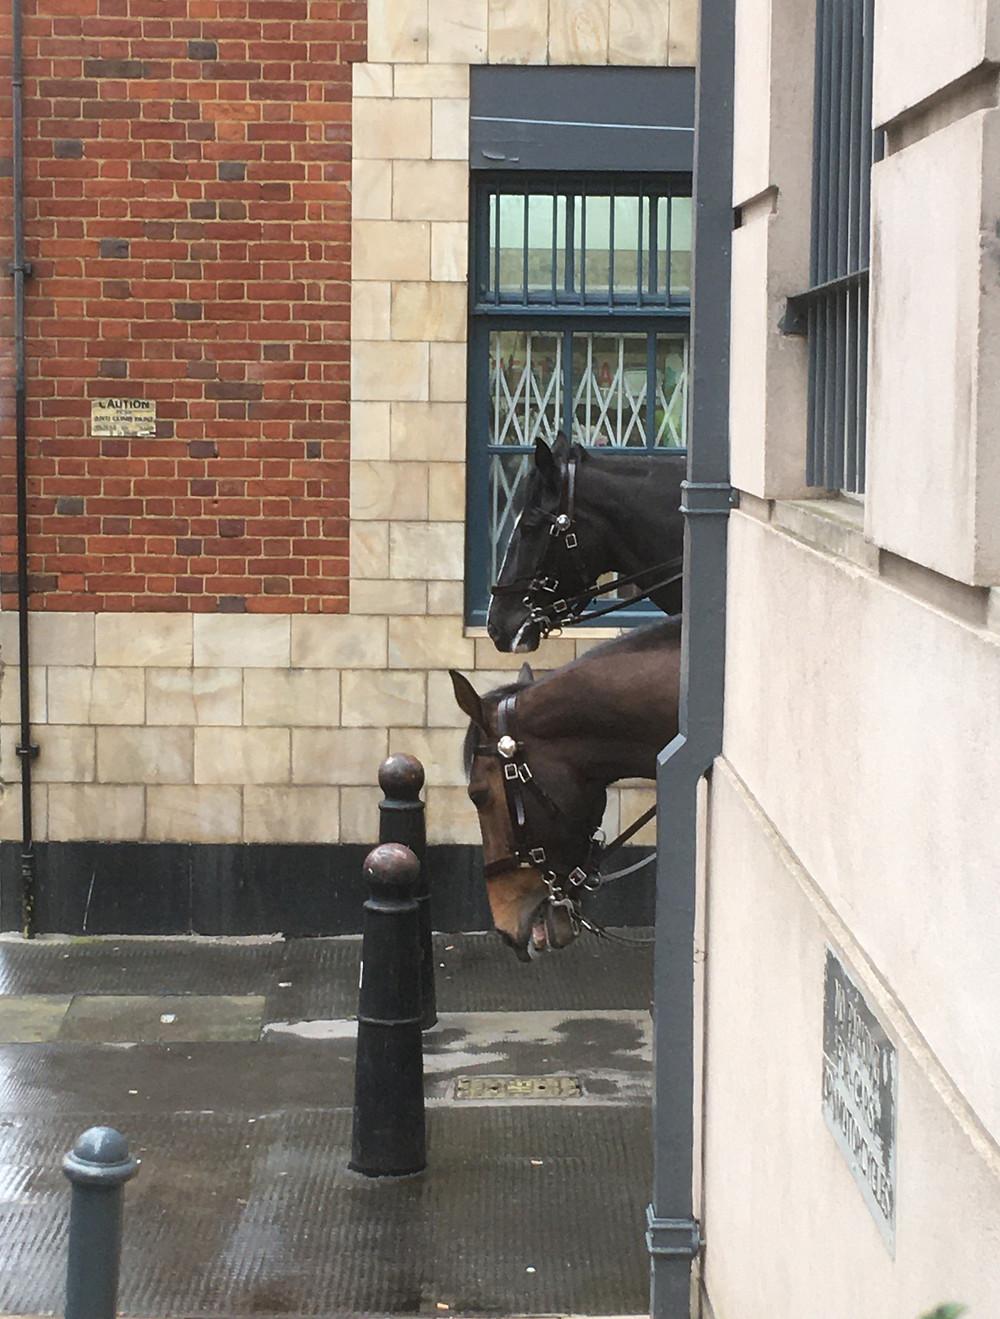 Two horses in Clerkenwell